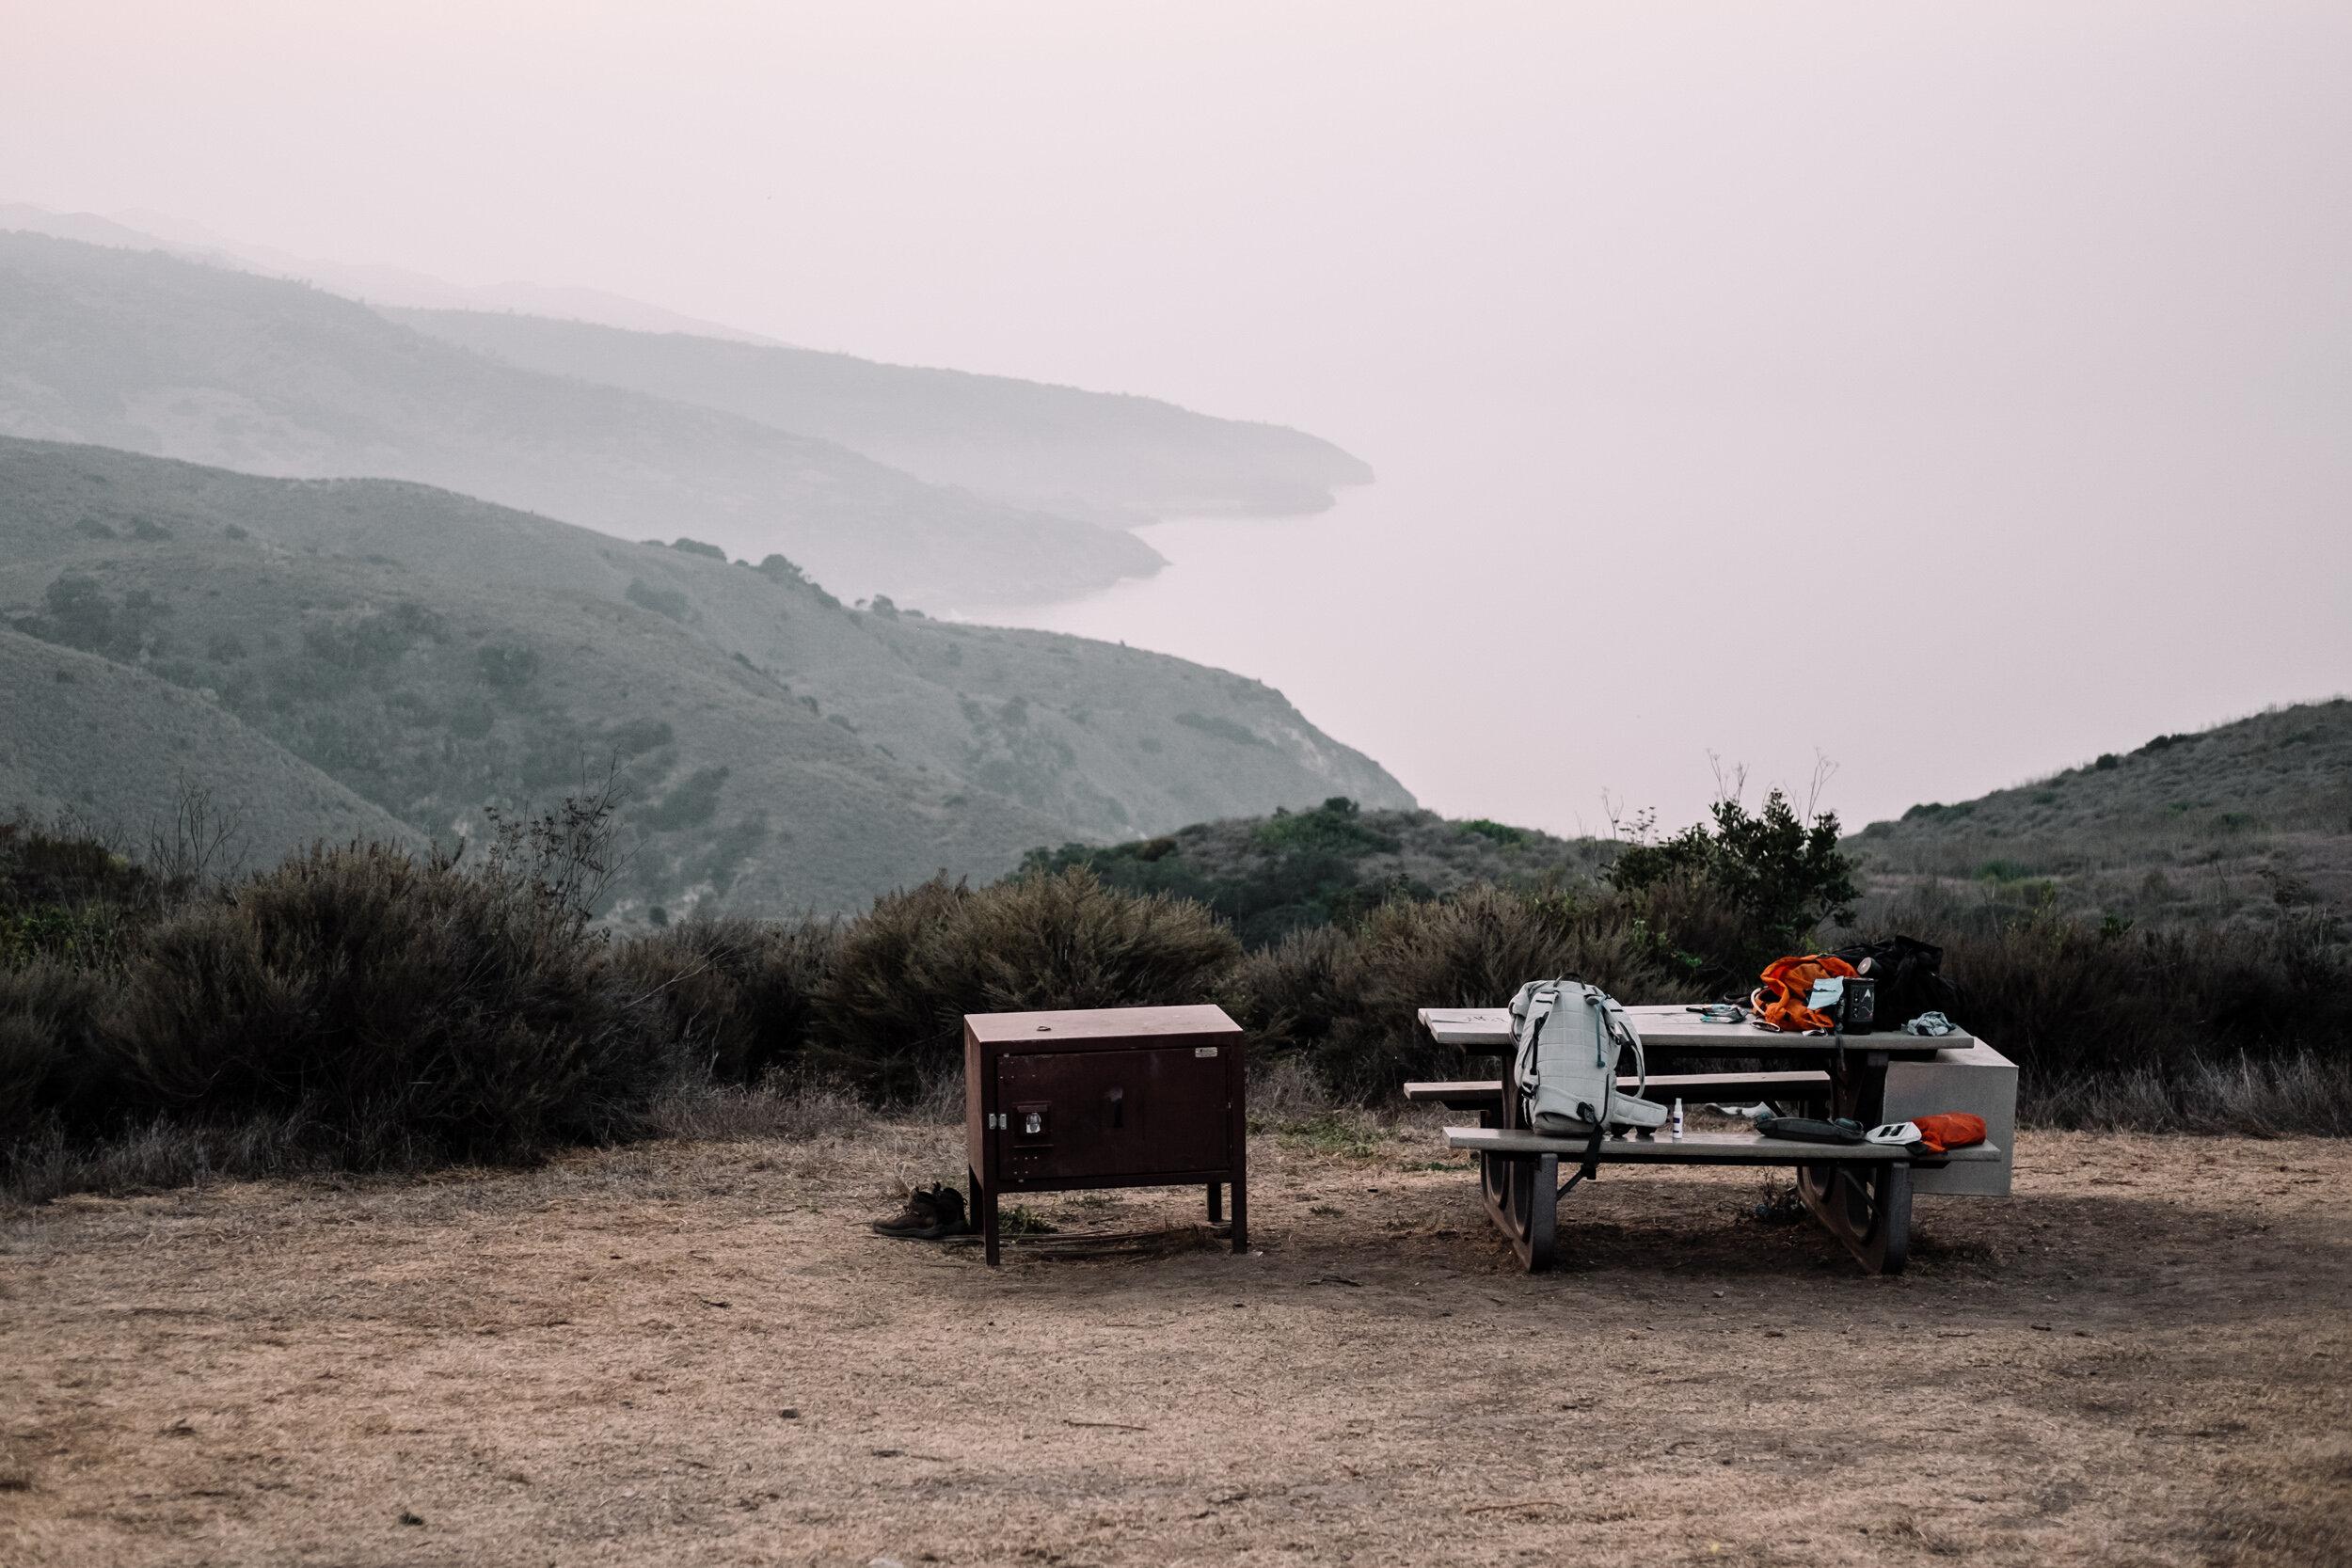 Rachel Off Duty: Campsite and Picnic Table at Santa Cruz Island, Channel Islands